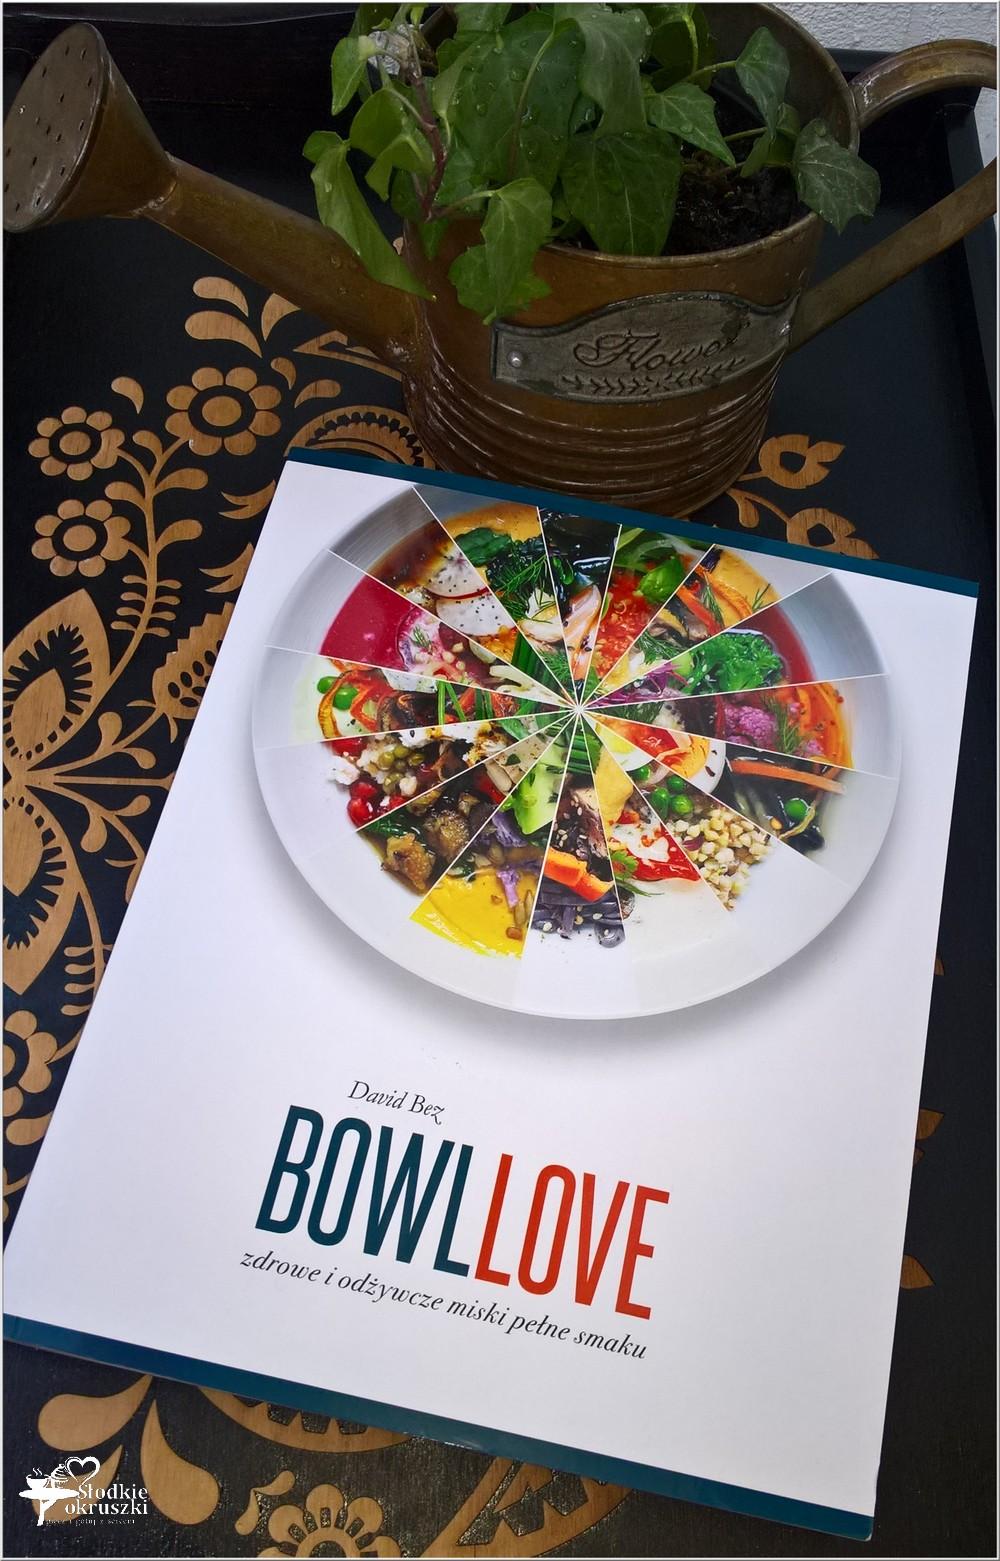 Bowllove. Recenzja (1)